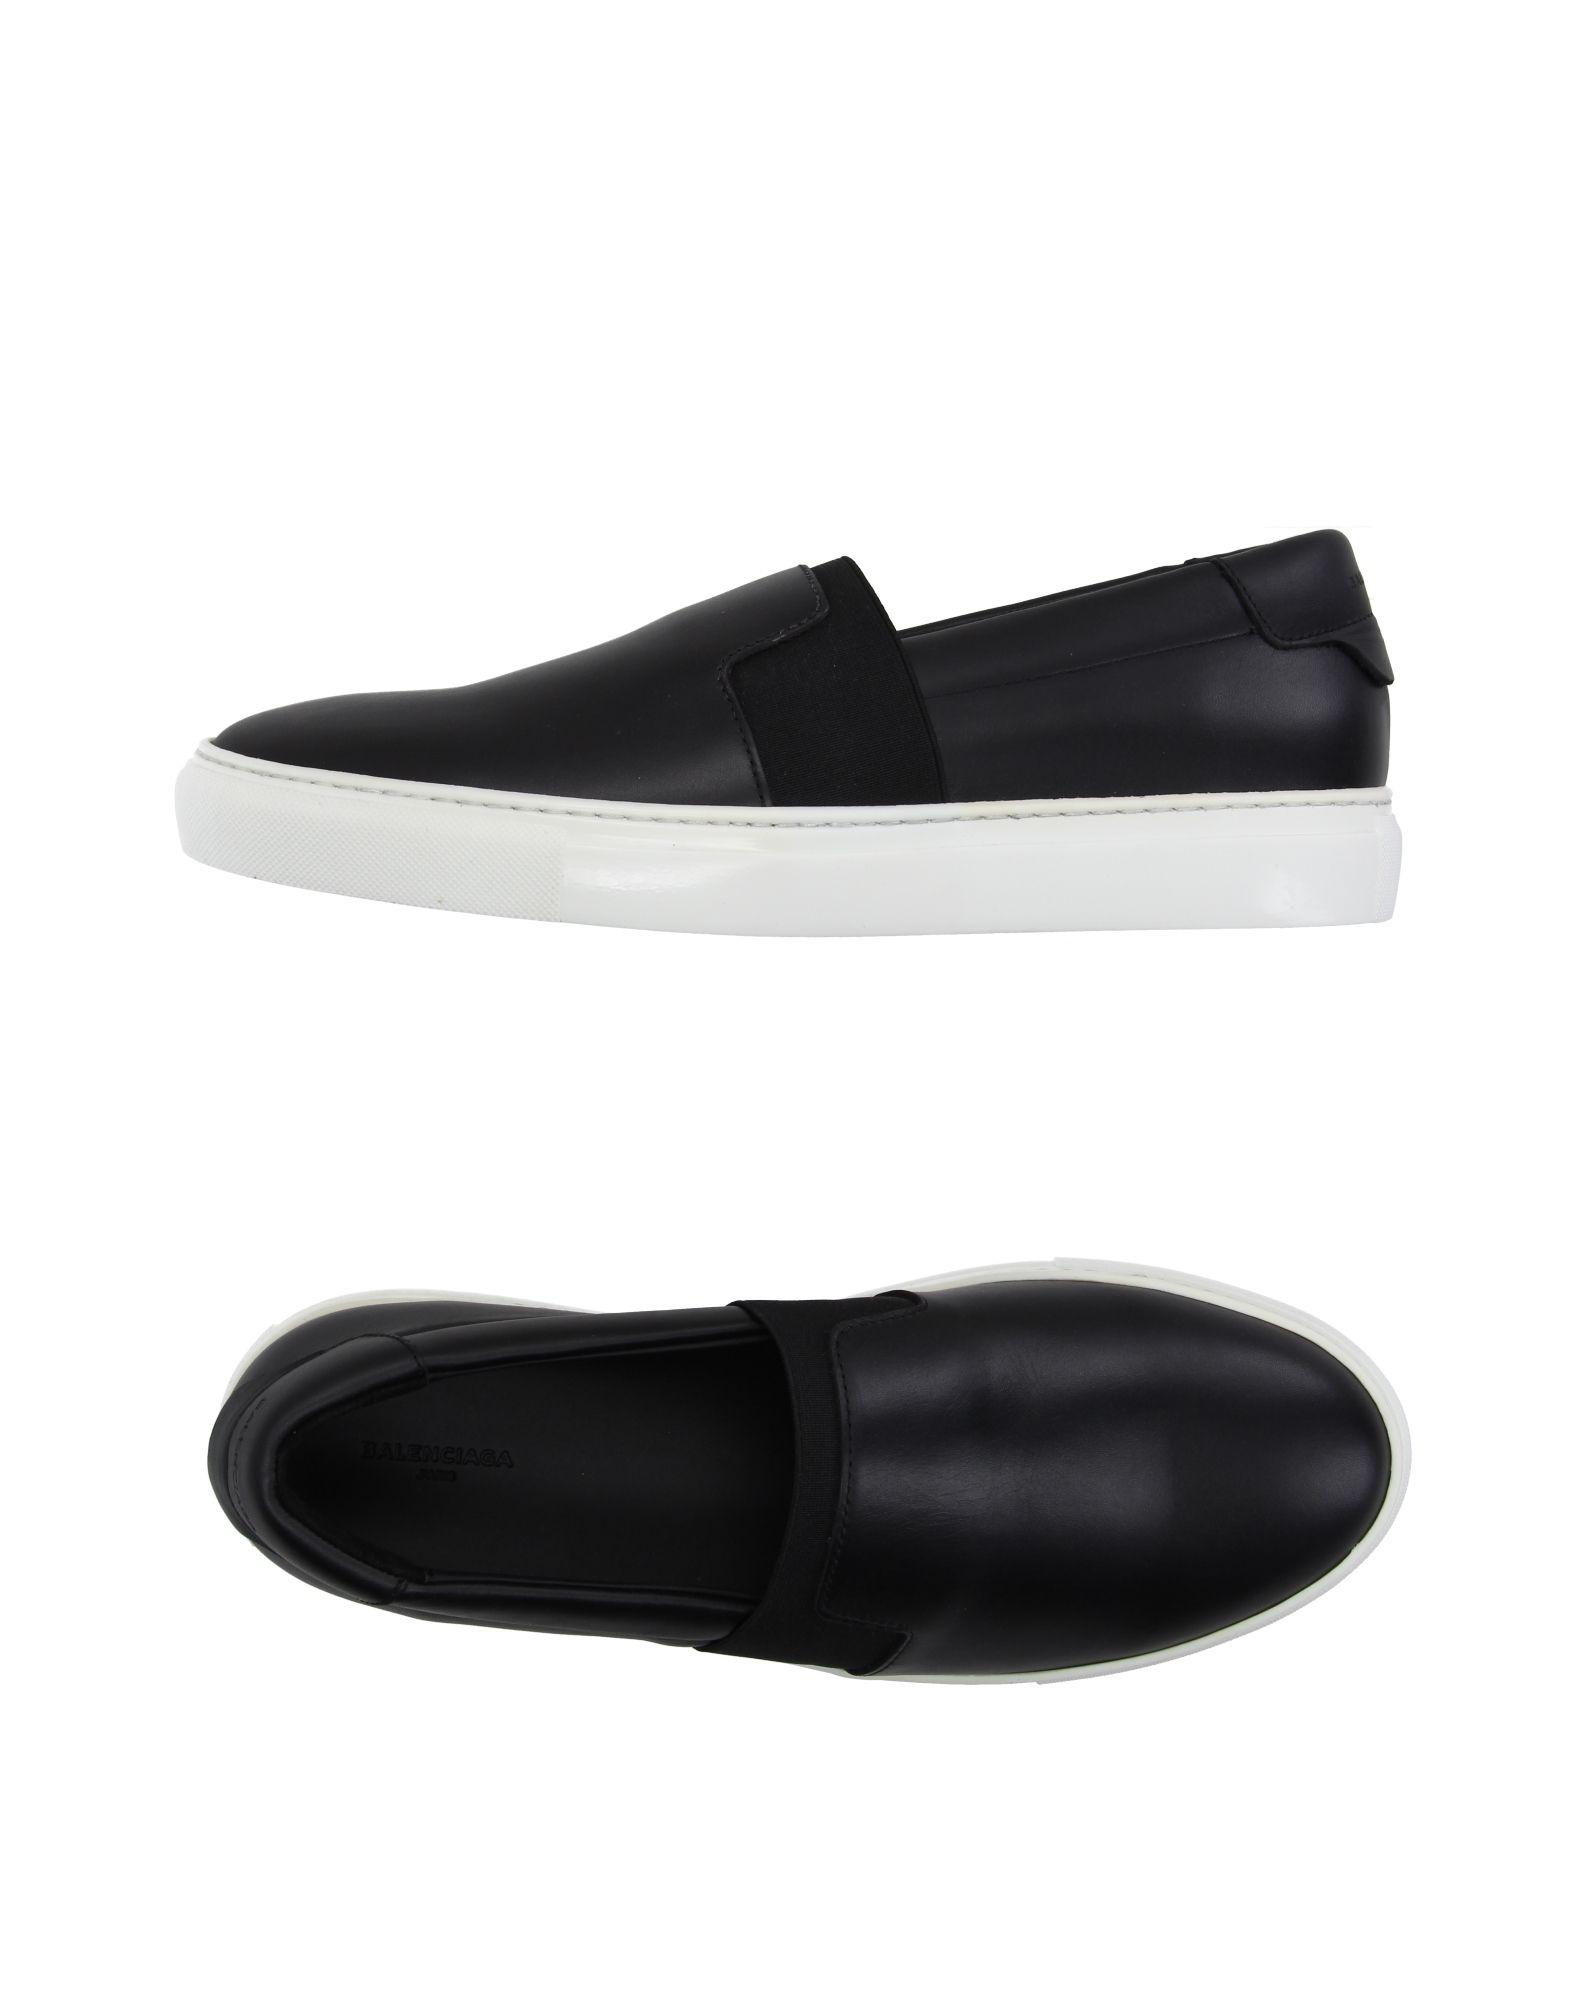 chaussures homme balenciaga soldes deuxi me d marque. Black Bedroom Furniture Sets. Home Design Ideas